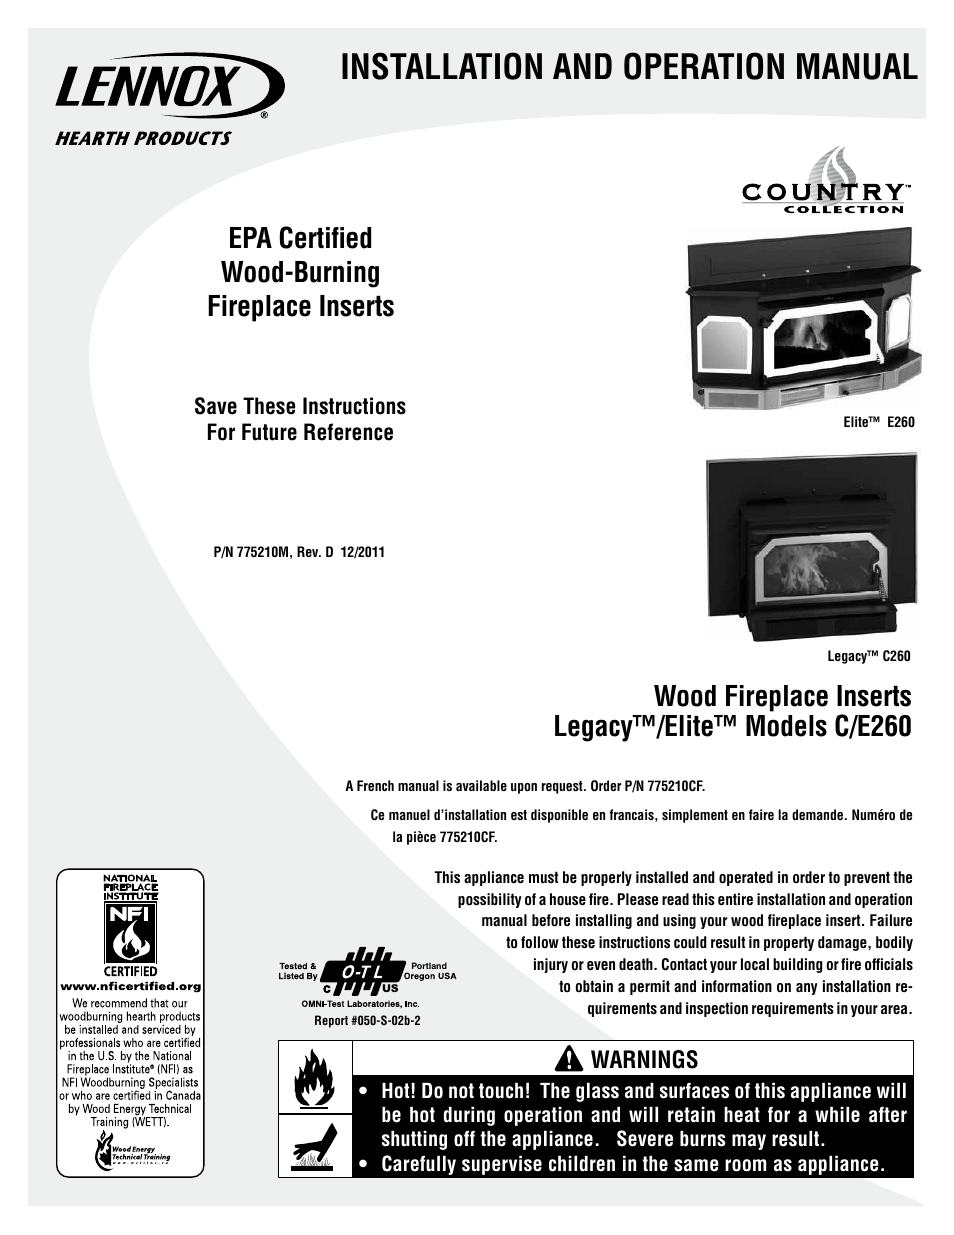 lennox international inc legacy c260 user manual 26 pages rh manualsdir com lennox owners manual lennox owners manual cbx25uh